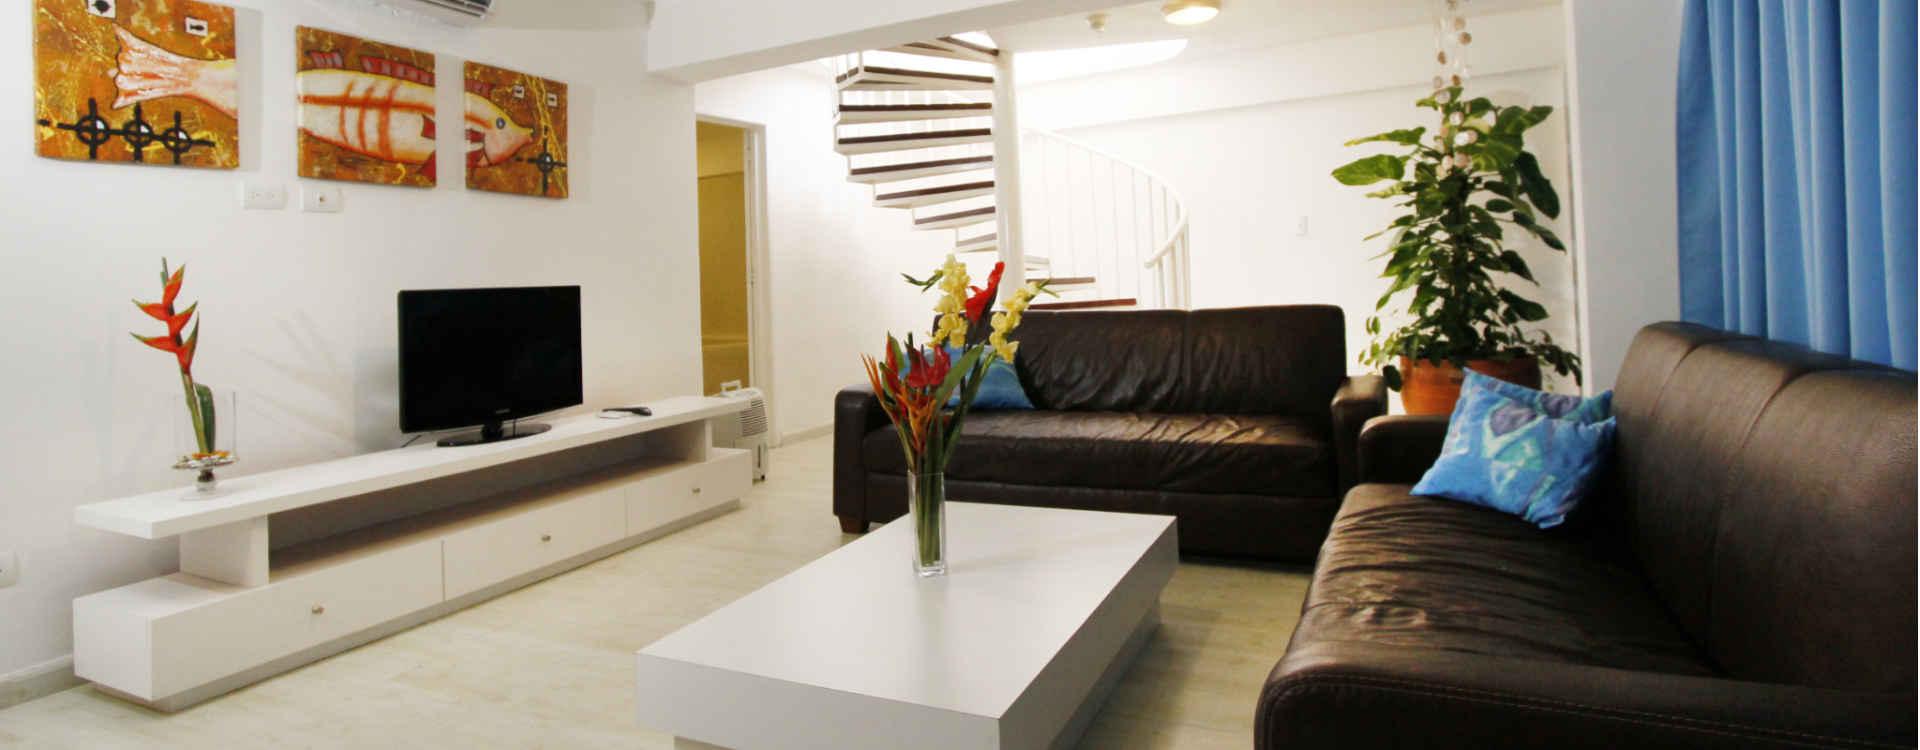 Sunsol Caribbean Beach Apartamento para 4 Personas